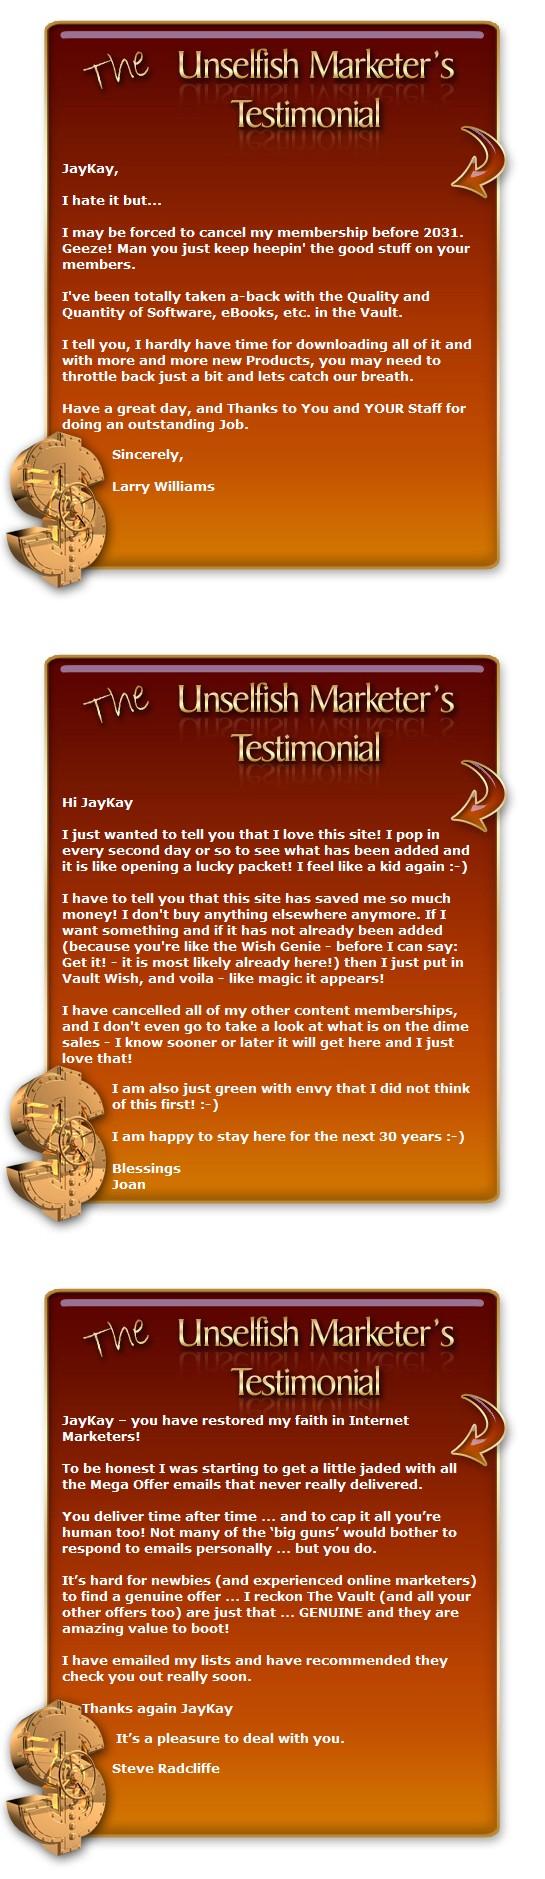 unselfish marketer testimonials 3